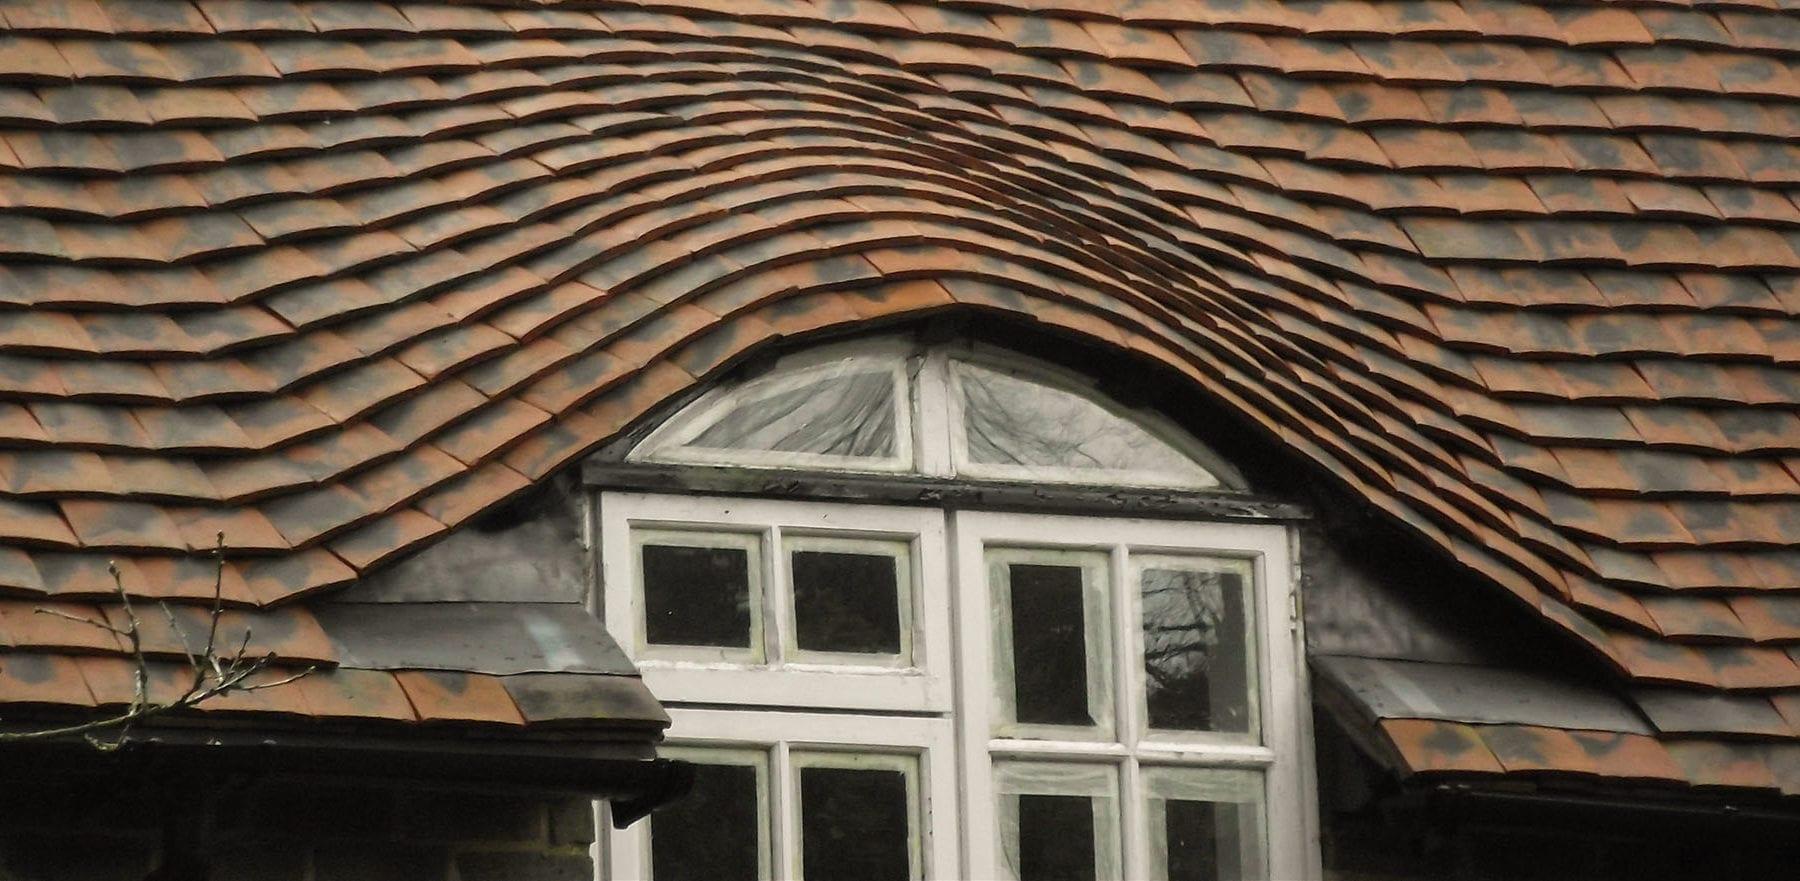 Lifestiles - Handmade Berkshire Clay Roof Tiles - Flimwell, England 2